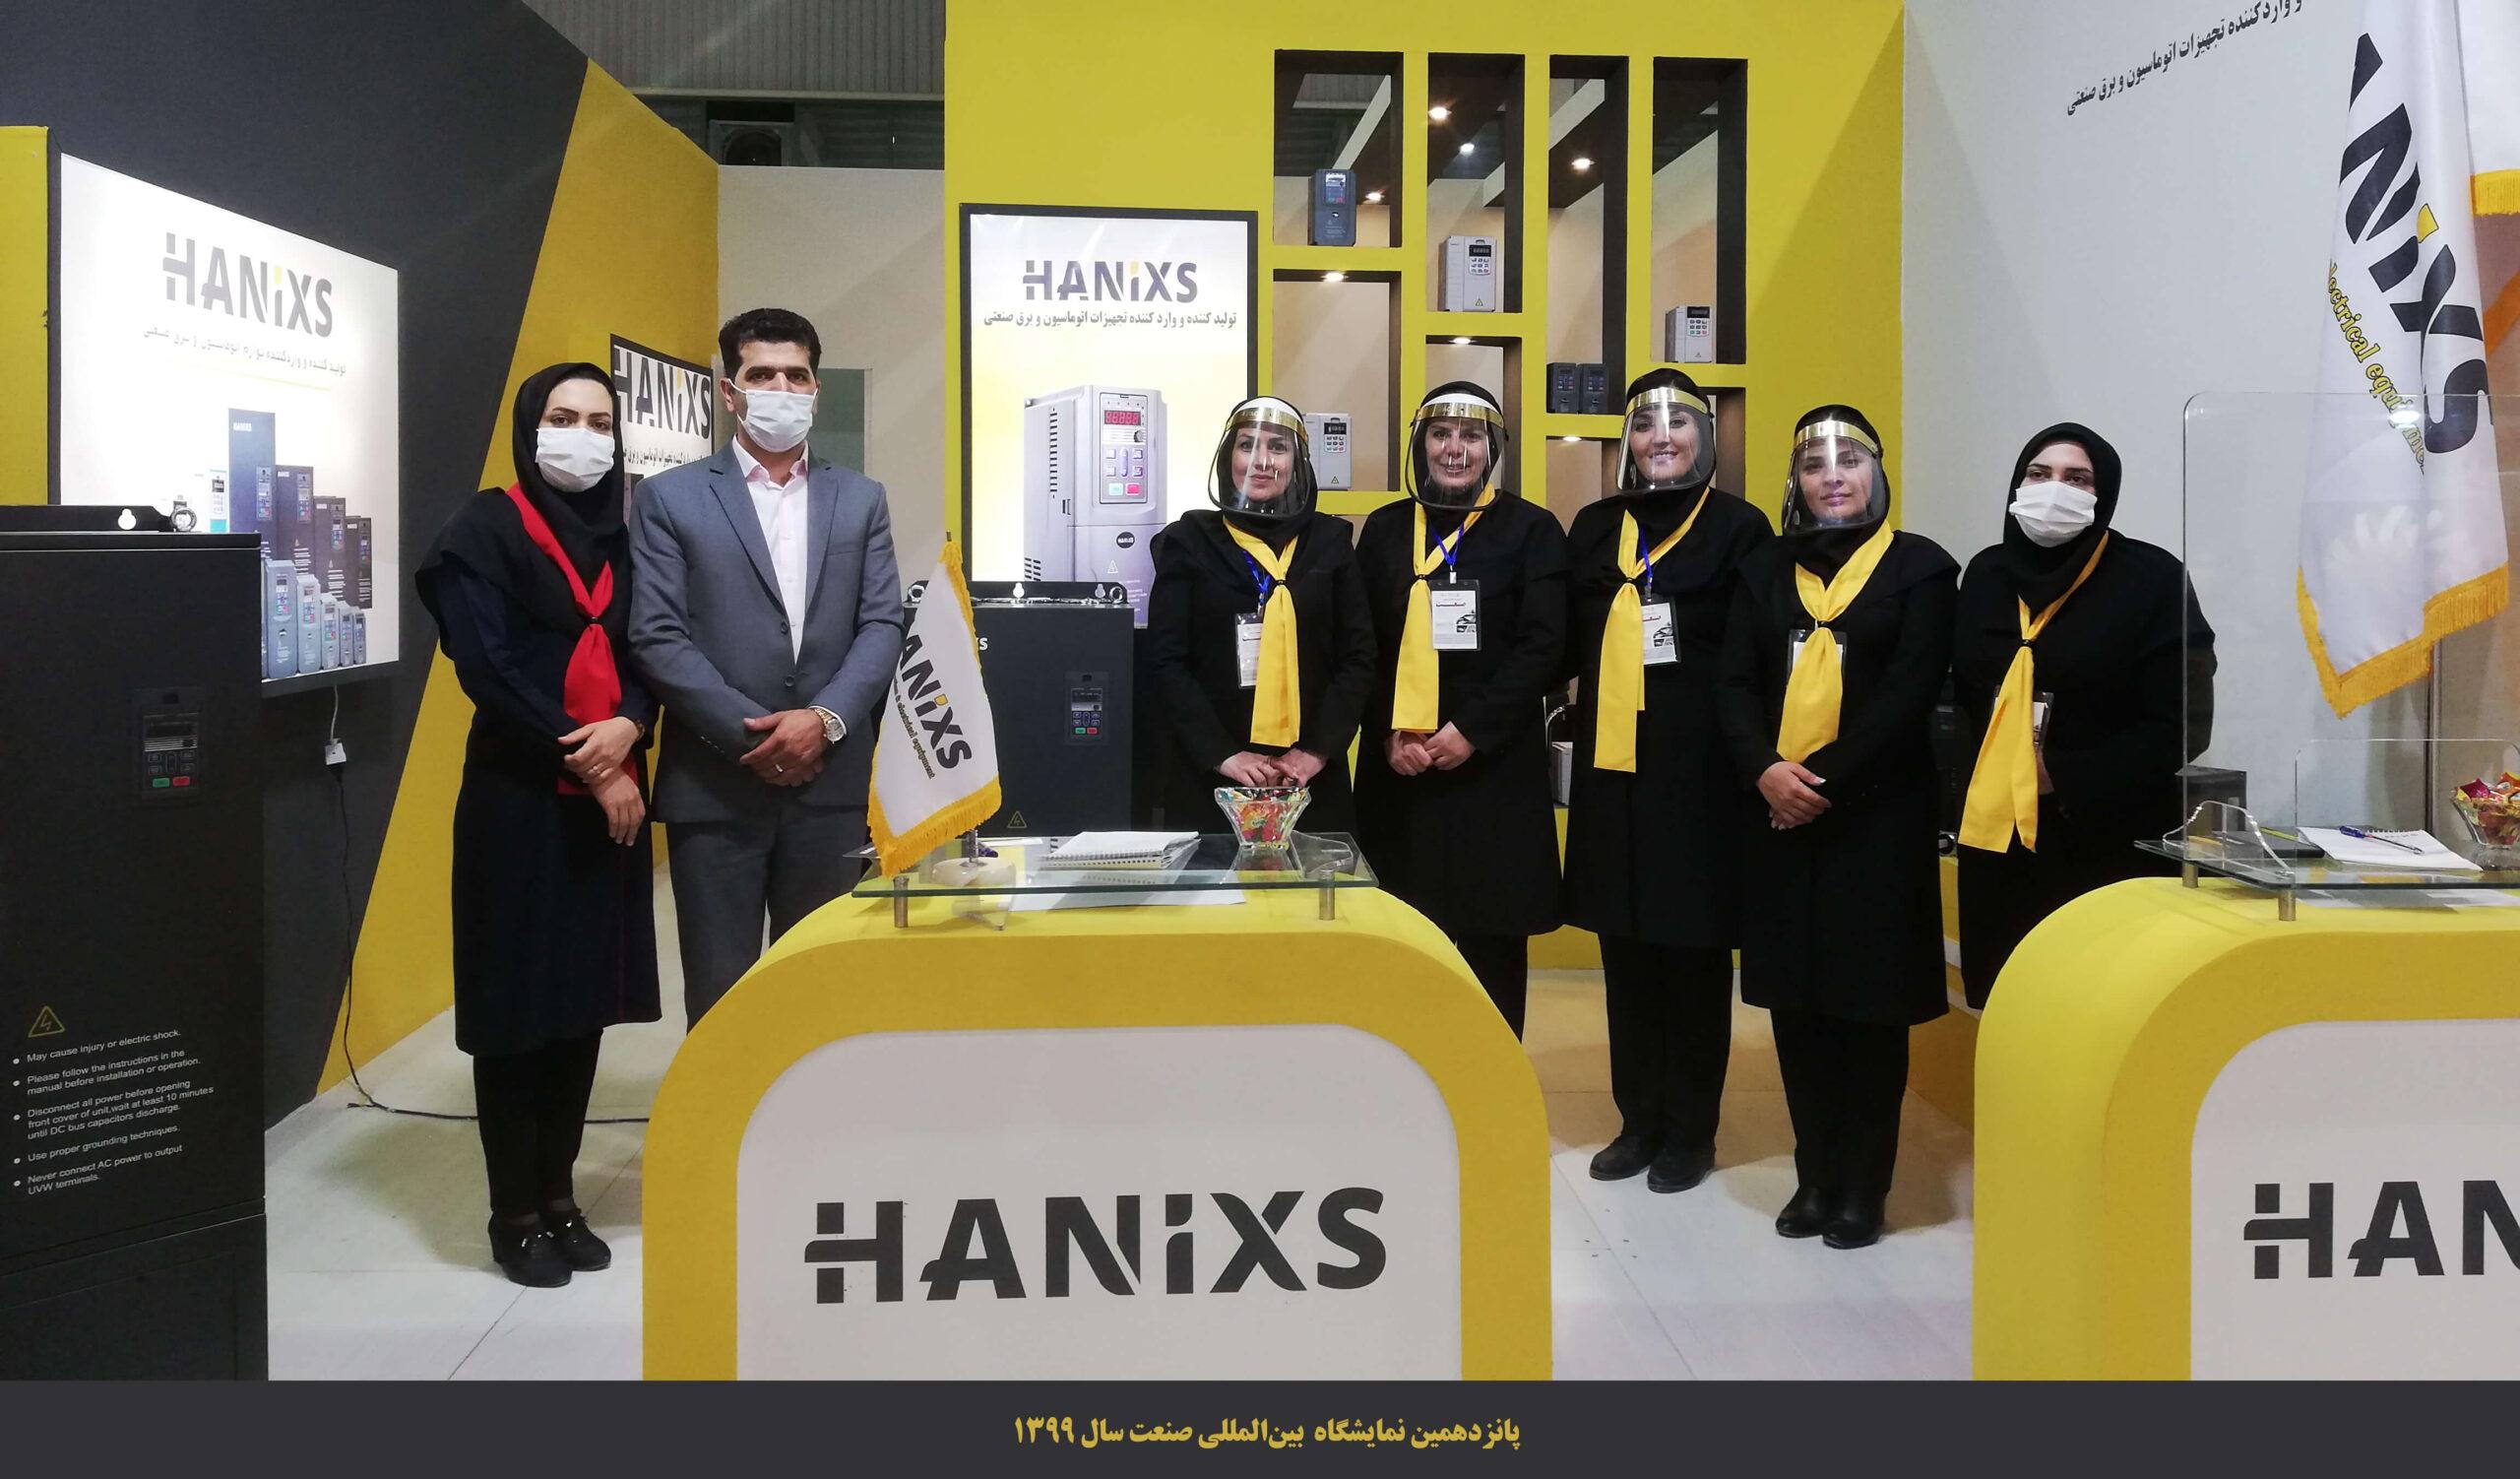 https://hanixs.com/